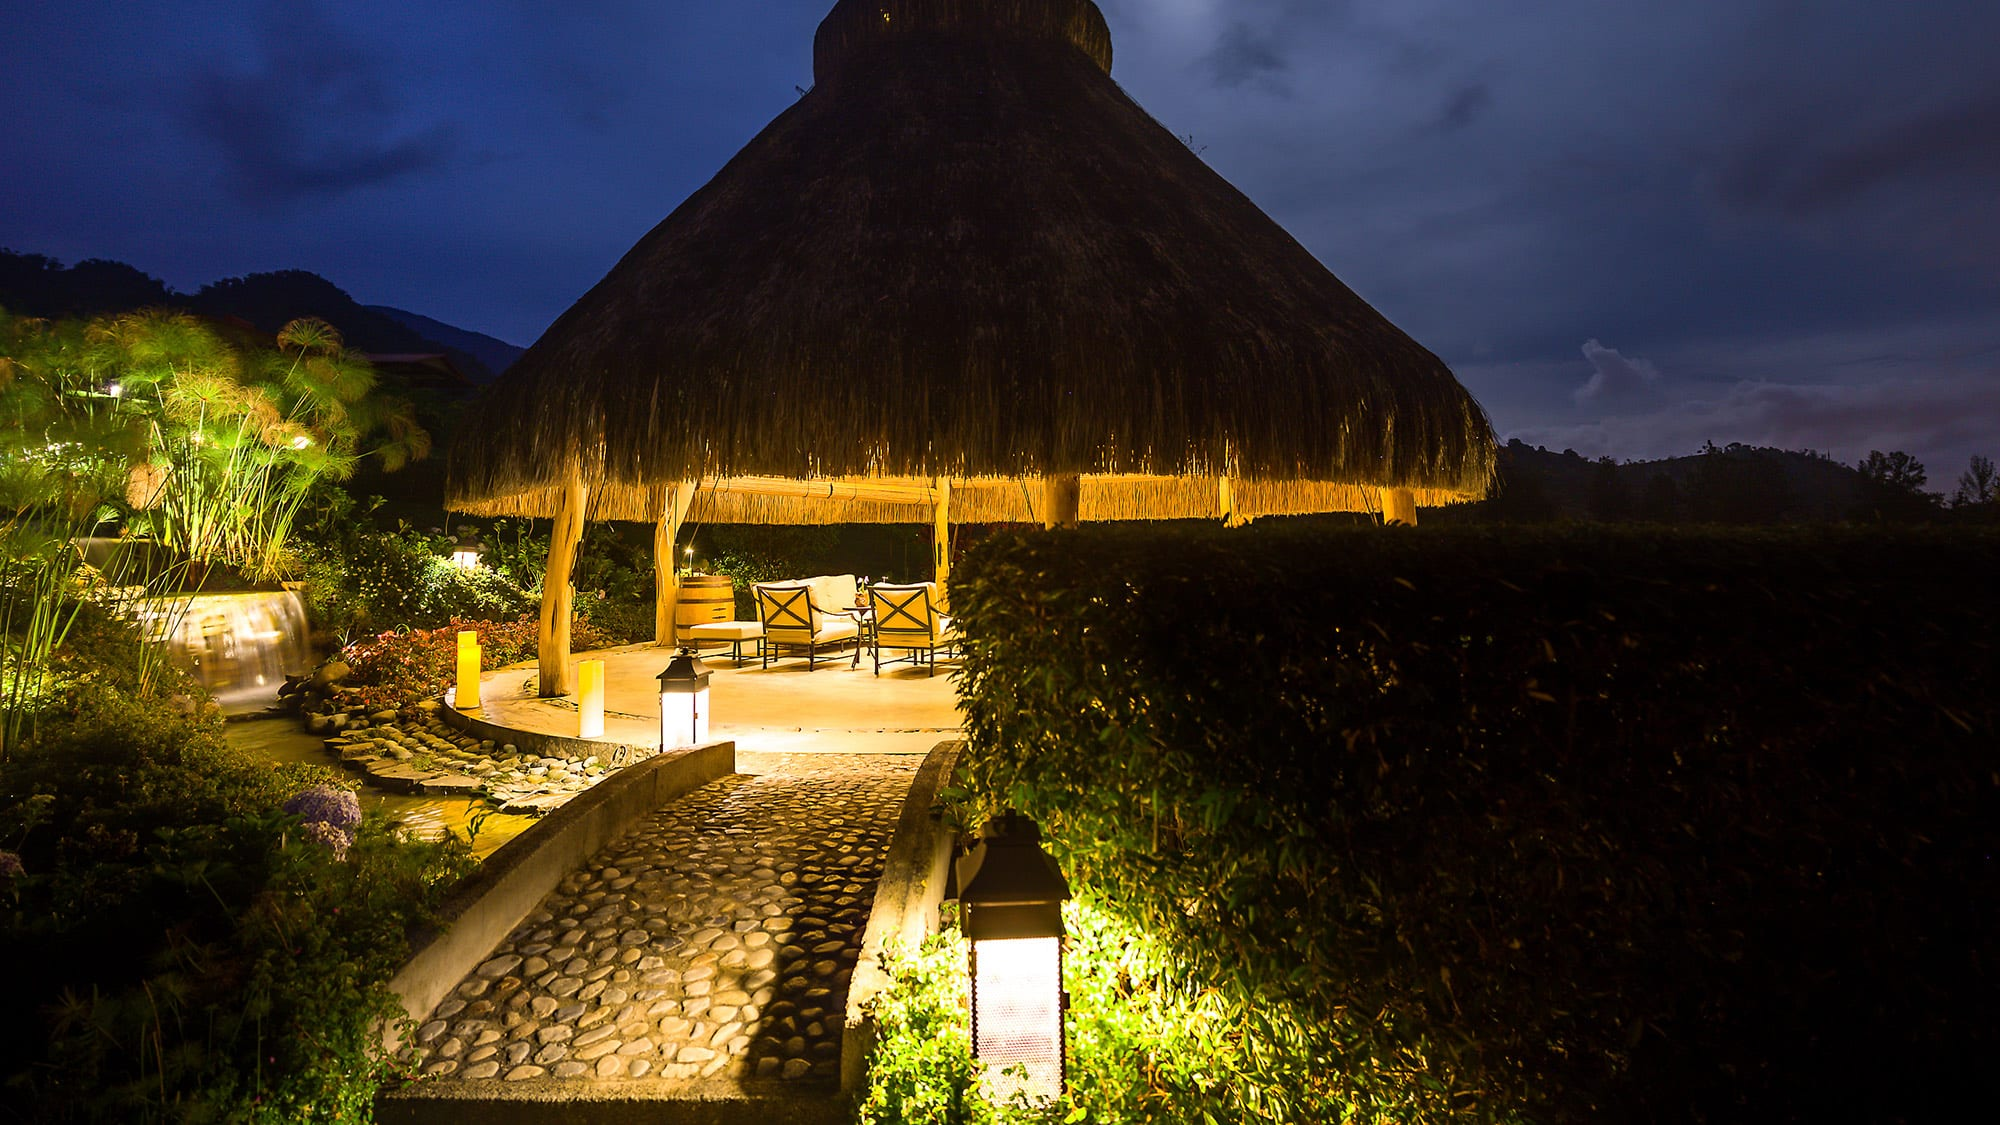 outdoor straw hut illuminated at dusk